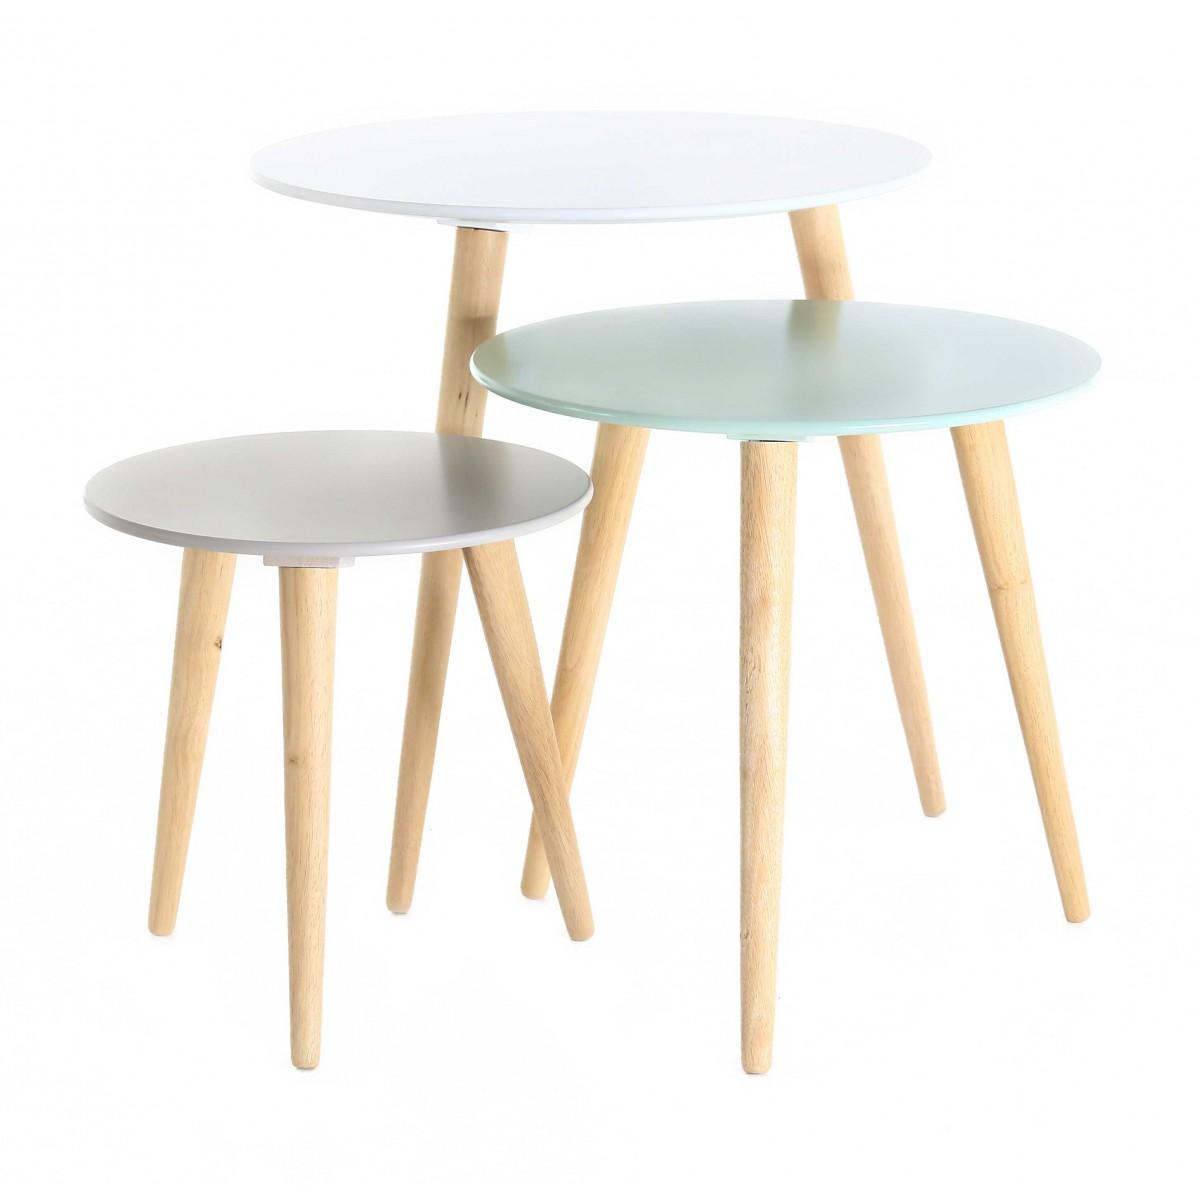 Table Basse Gigogne Blanche Et Bois Lille Menage Fr Maison